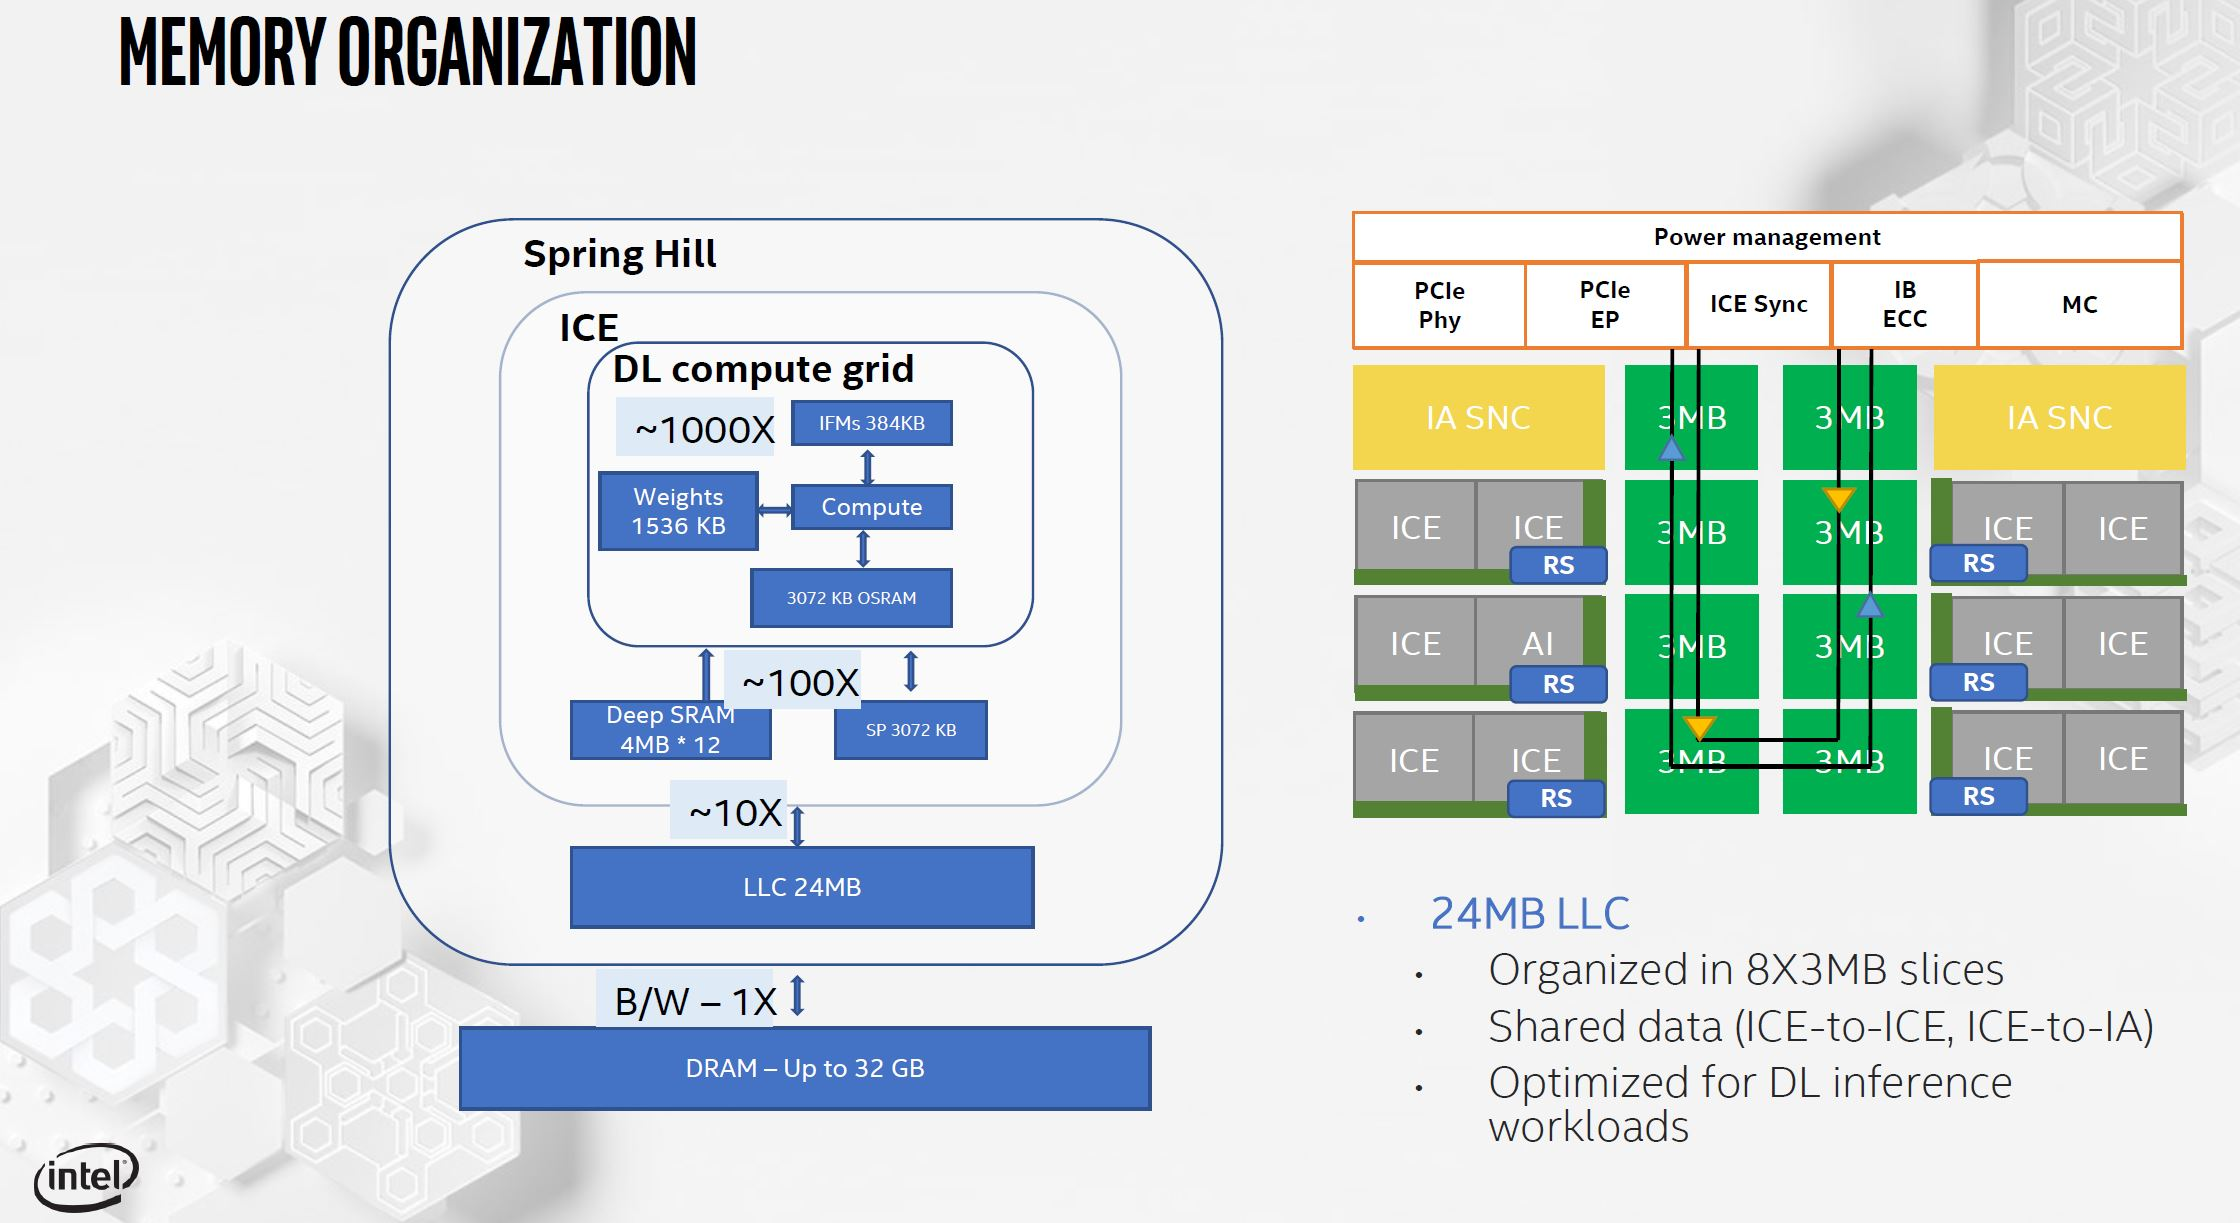 Intel NNP I 1000 Spring Hill Memory Organization